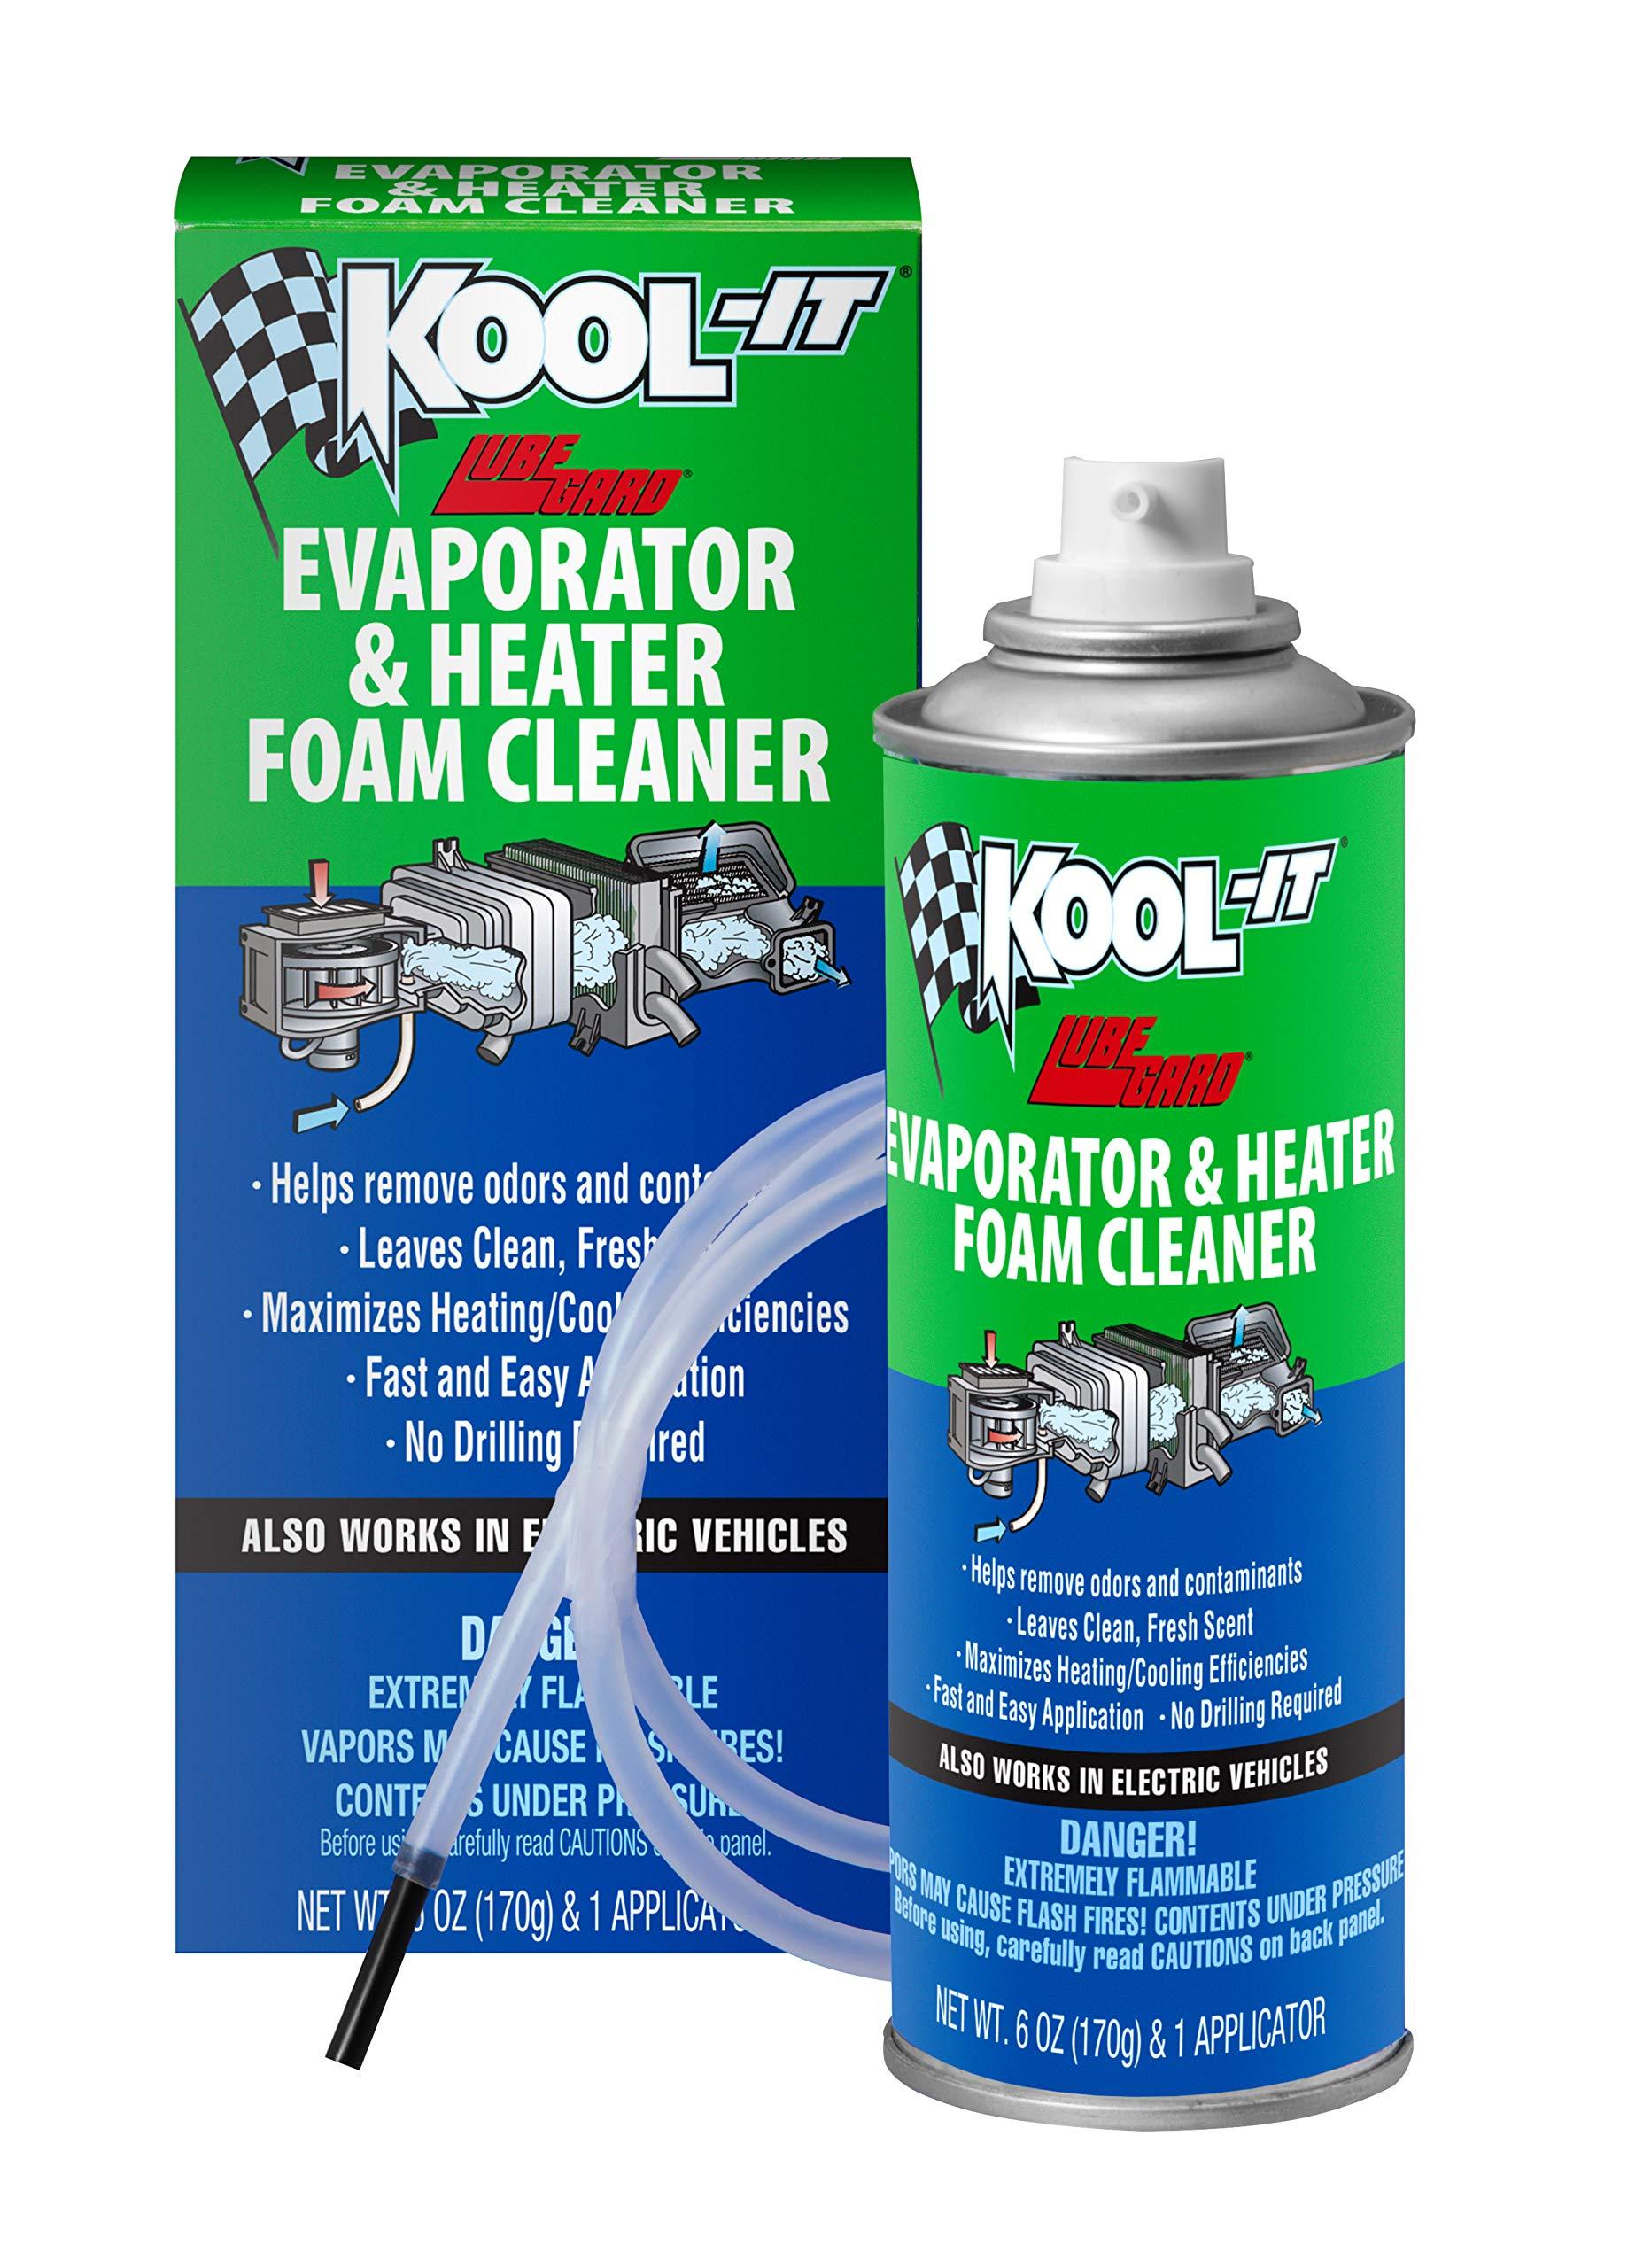 Lubegard 96030 Kool-It Evaporator and Heater Foam Cleaner